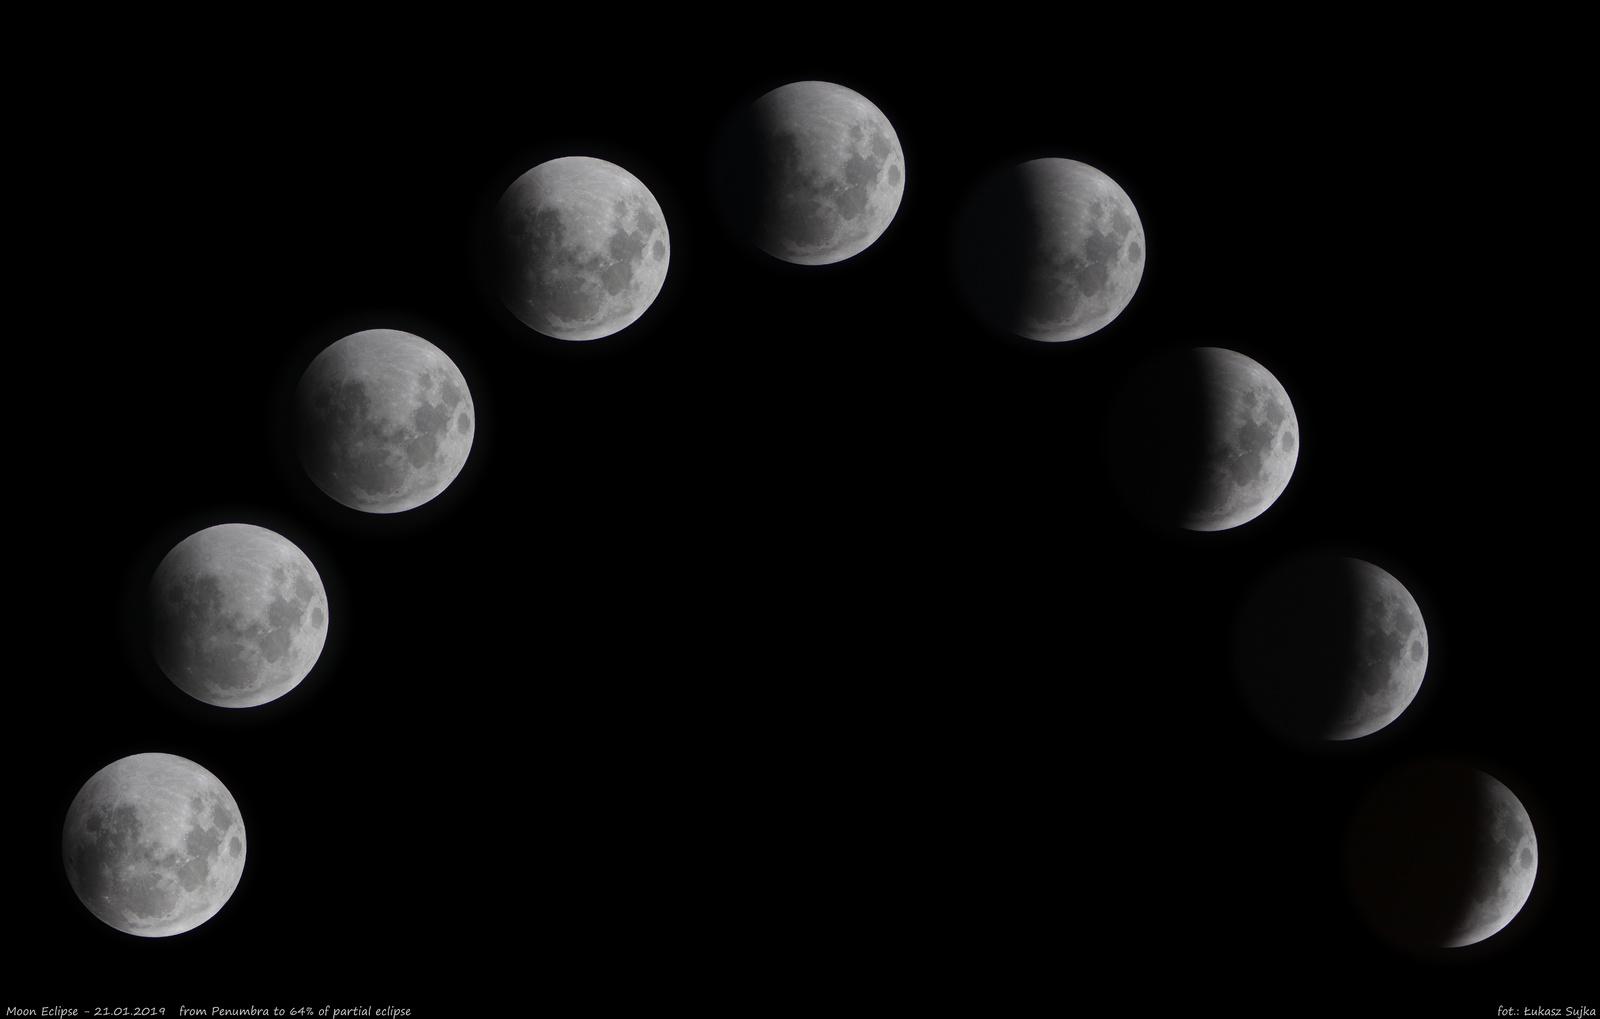 230129038_MoonEclipsev2.thumb.jpg.6c9e2bc63705d71f2aba1aac3a146707.jpg